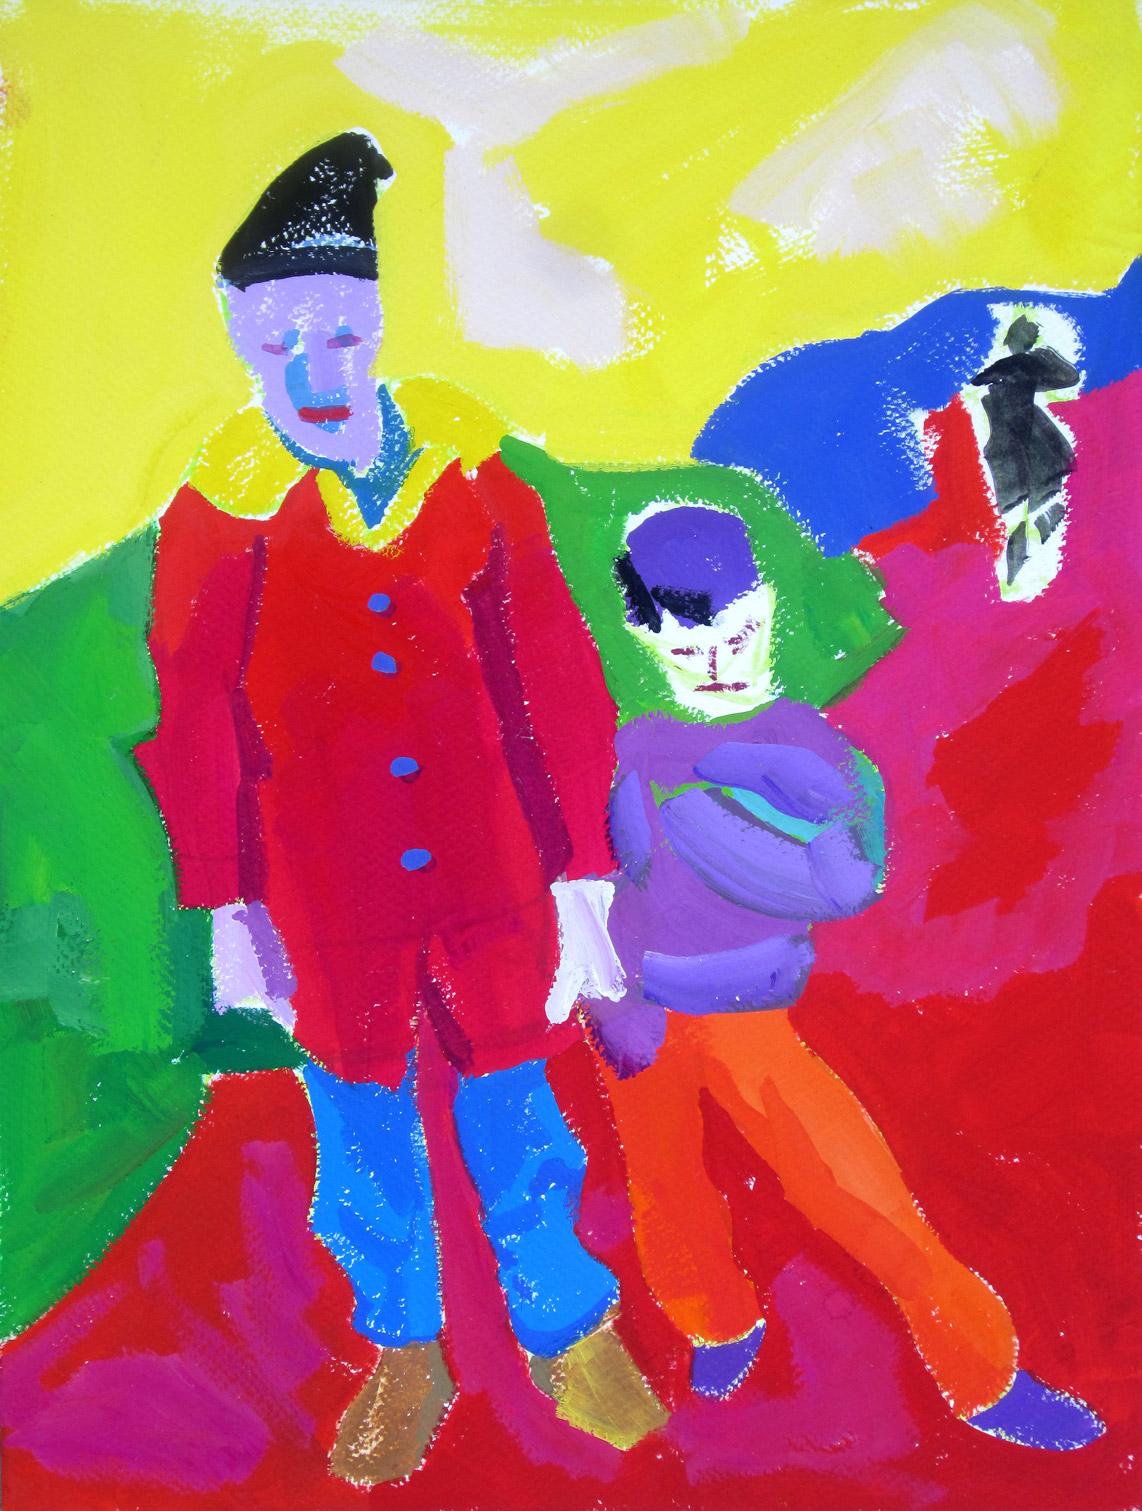 Oče in sin, 2009